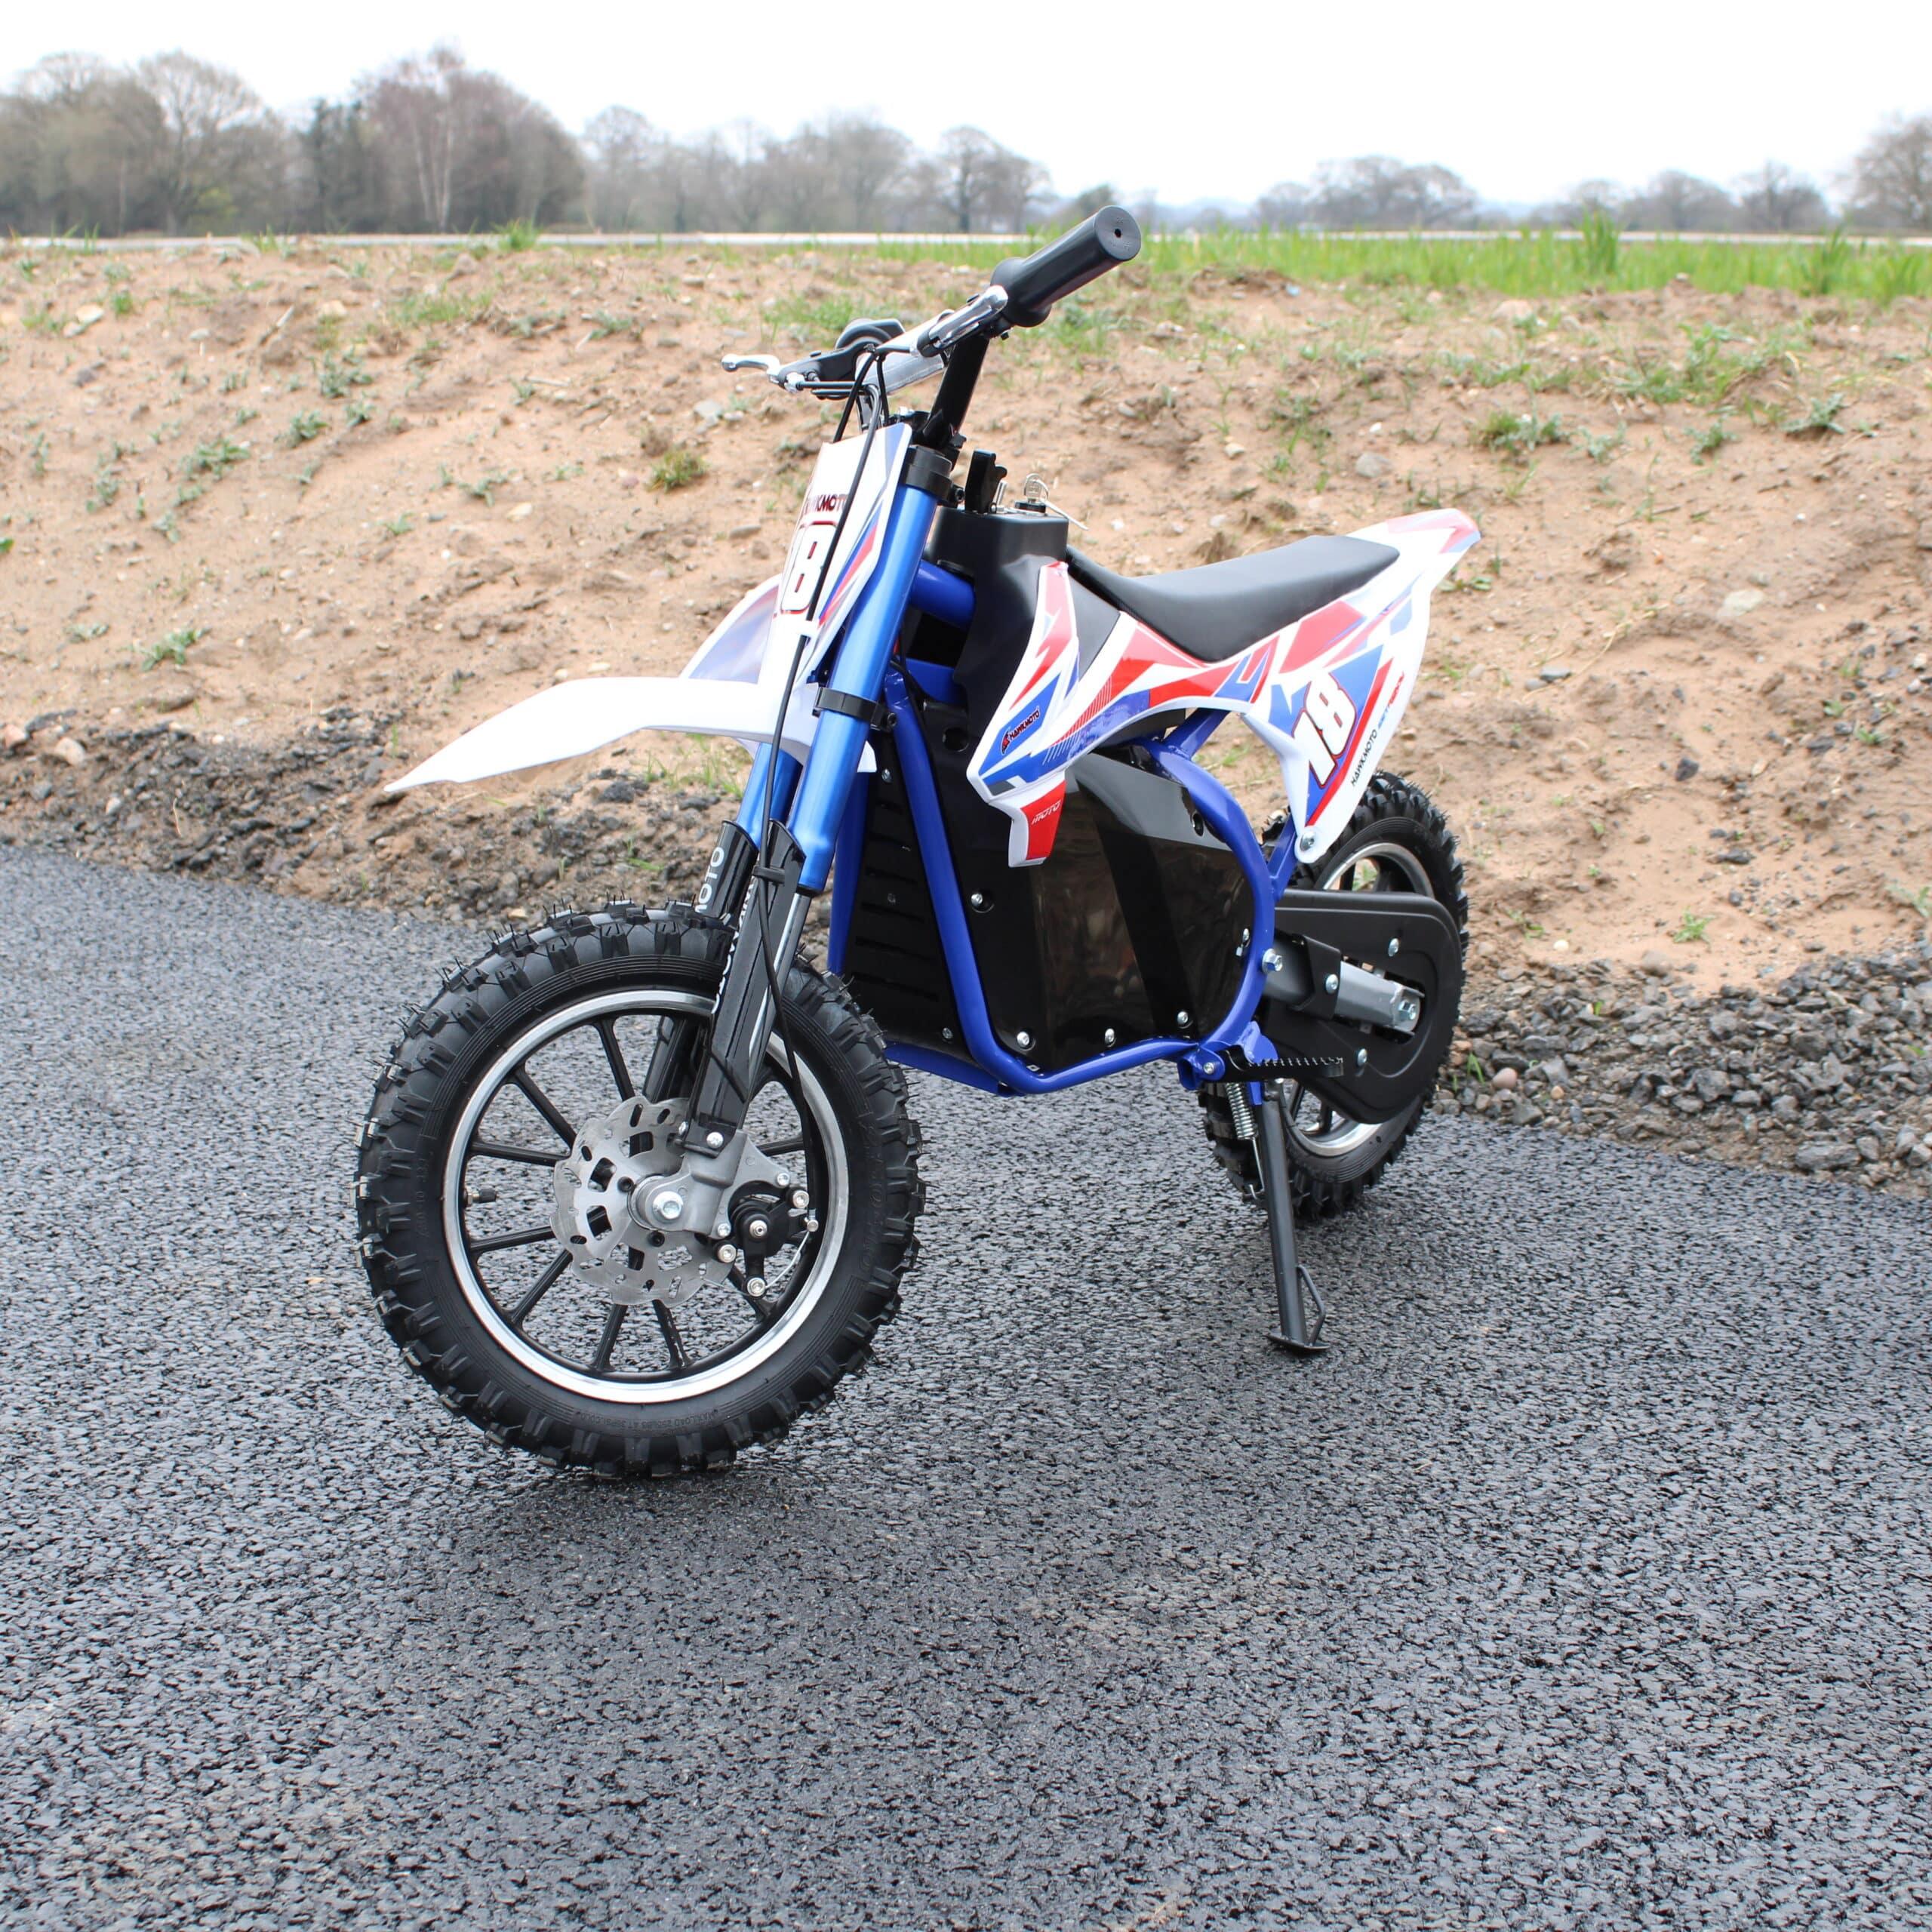 Hawkmoto Electric Mini Dirt Bike Pro Version With 500w 36v Li-ion Battery Blue